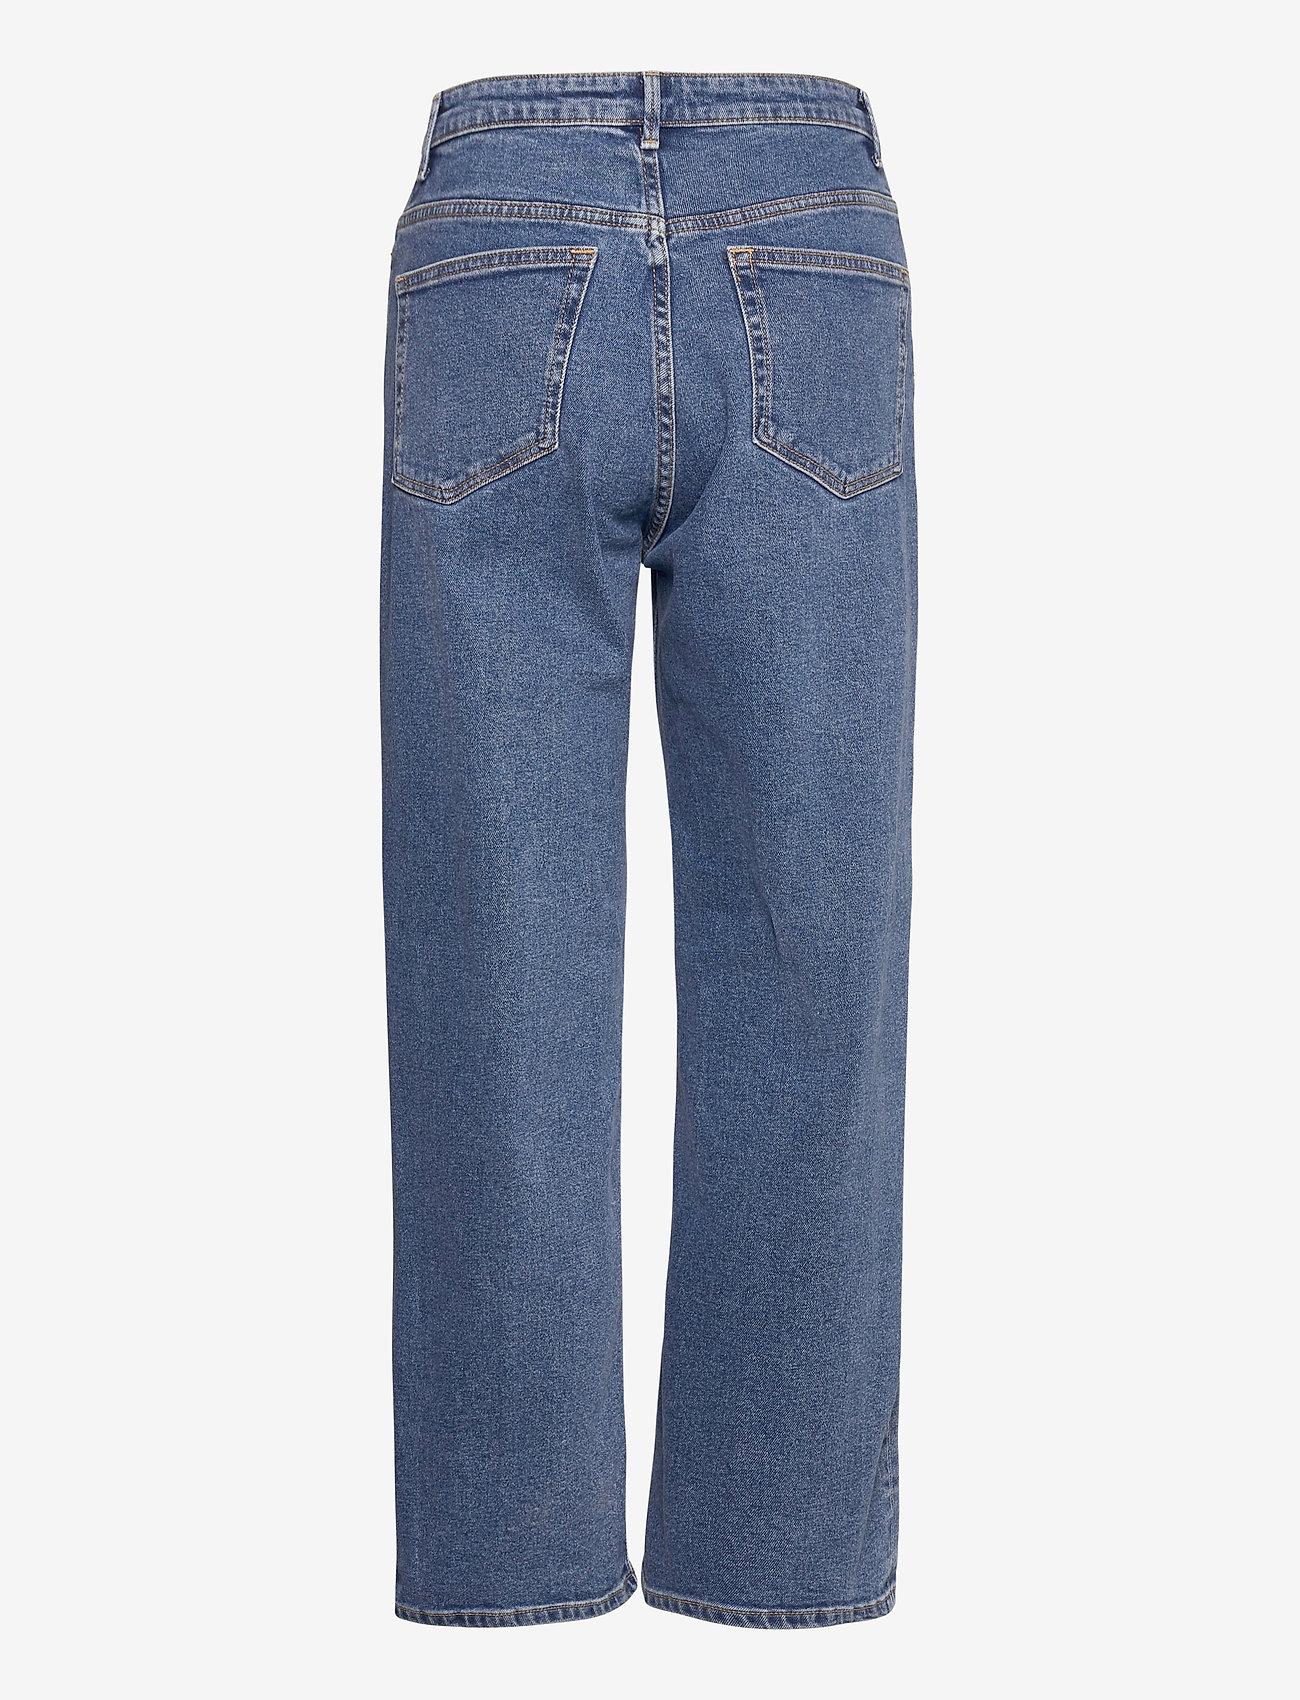 Trousers Denim Hanna Retro Blu (Denim Blue) (29.99 €) - Lindex kgoYK